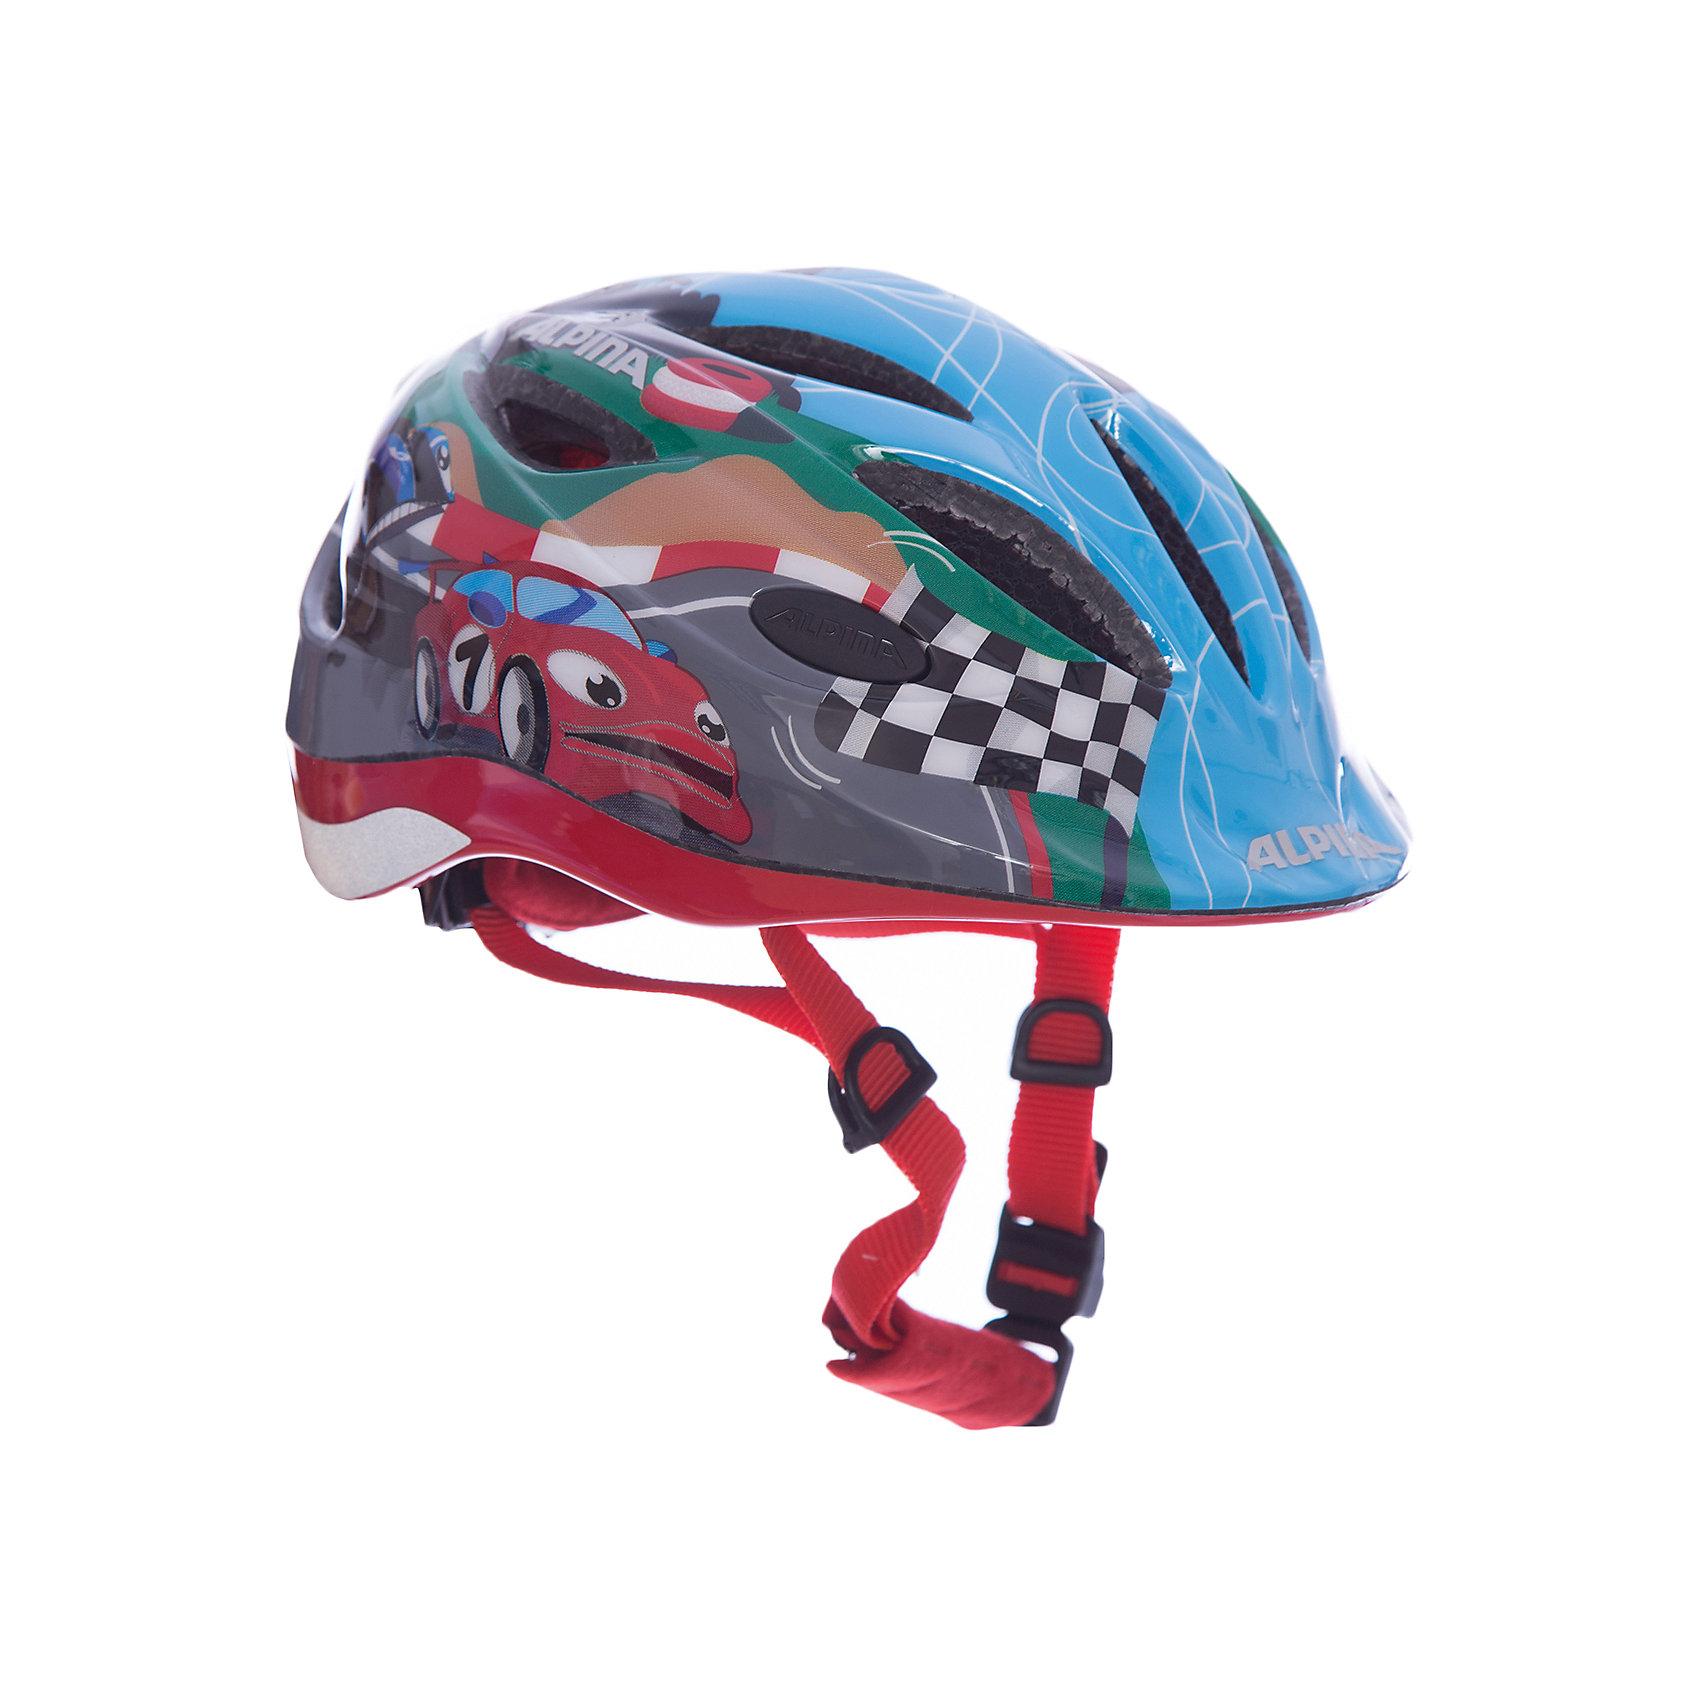 Летний шлем ALPINA Gamma 2.0 Flash racingЗащита, шлемы<br><br><br>Ширина мм: 295<br>Глубина мм: 223<br>Высота мм: 170<br>Вес г: 484<br>Цвет: узорчатый<br>Возраст от месяцев: 12<br>Возраст до месяцев: 36<br>Пол: Мужской<br>Возраст: Детский<br>Размер: 46-51,51-56<br>SKU: 4467443